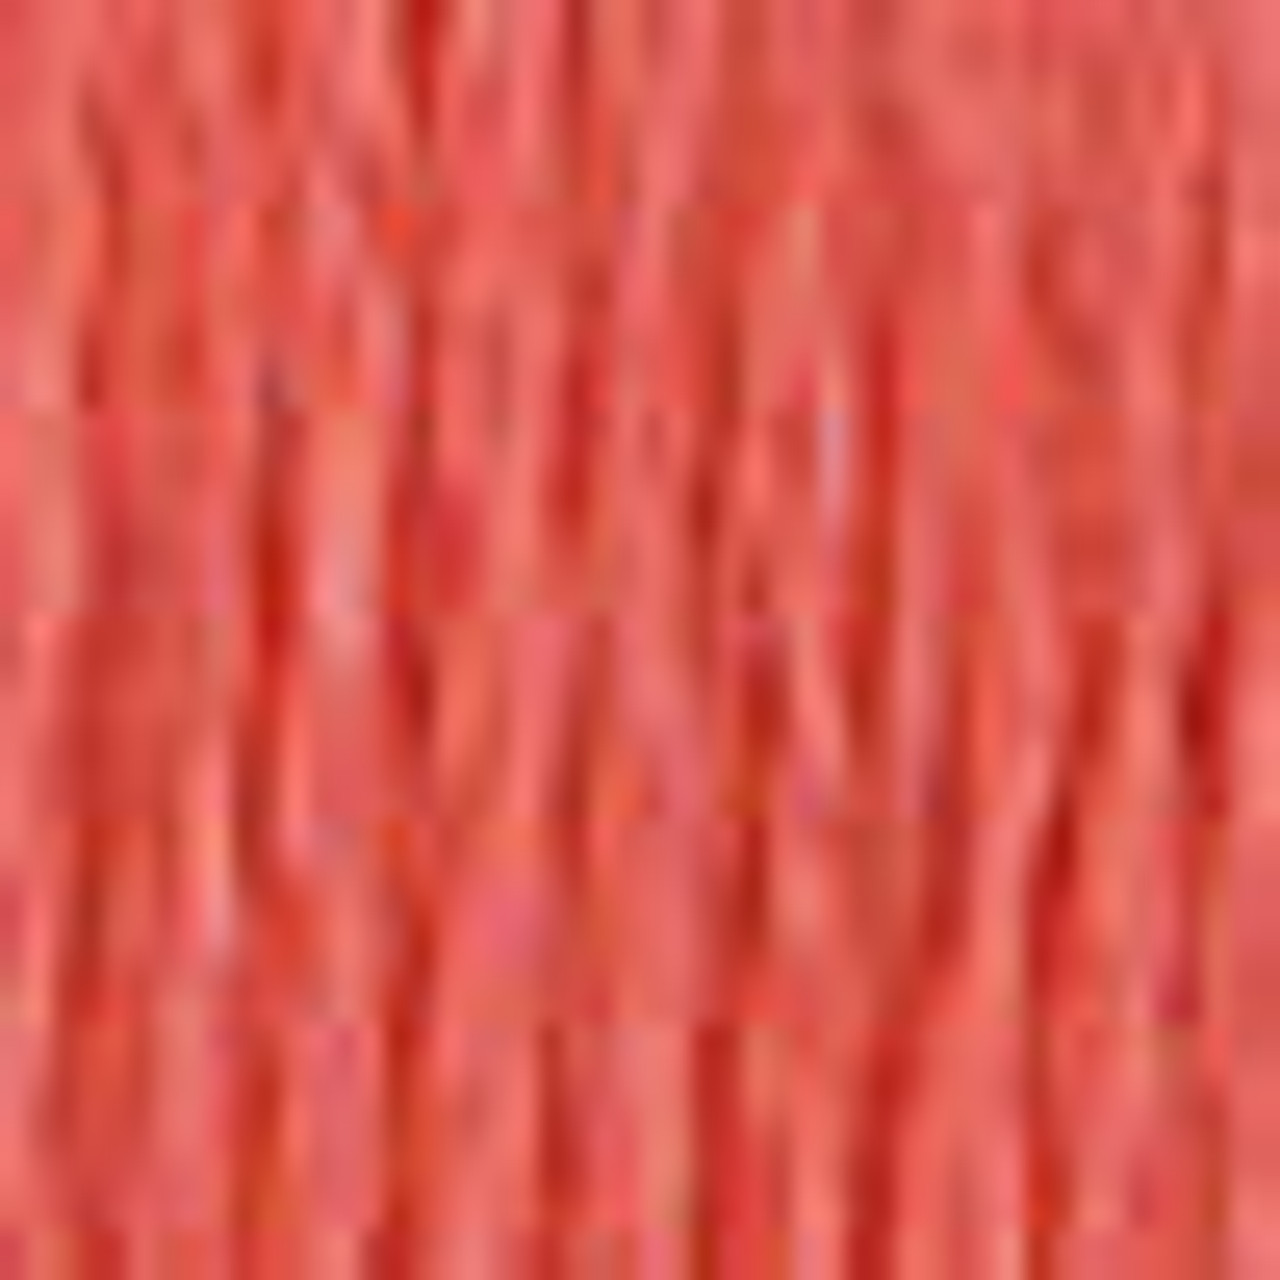 DMC # 356 Medium Terra Cotta Floss / Thread